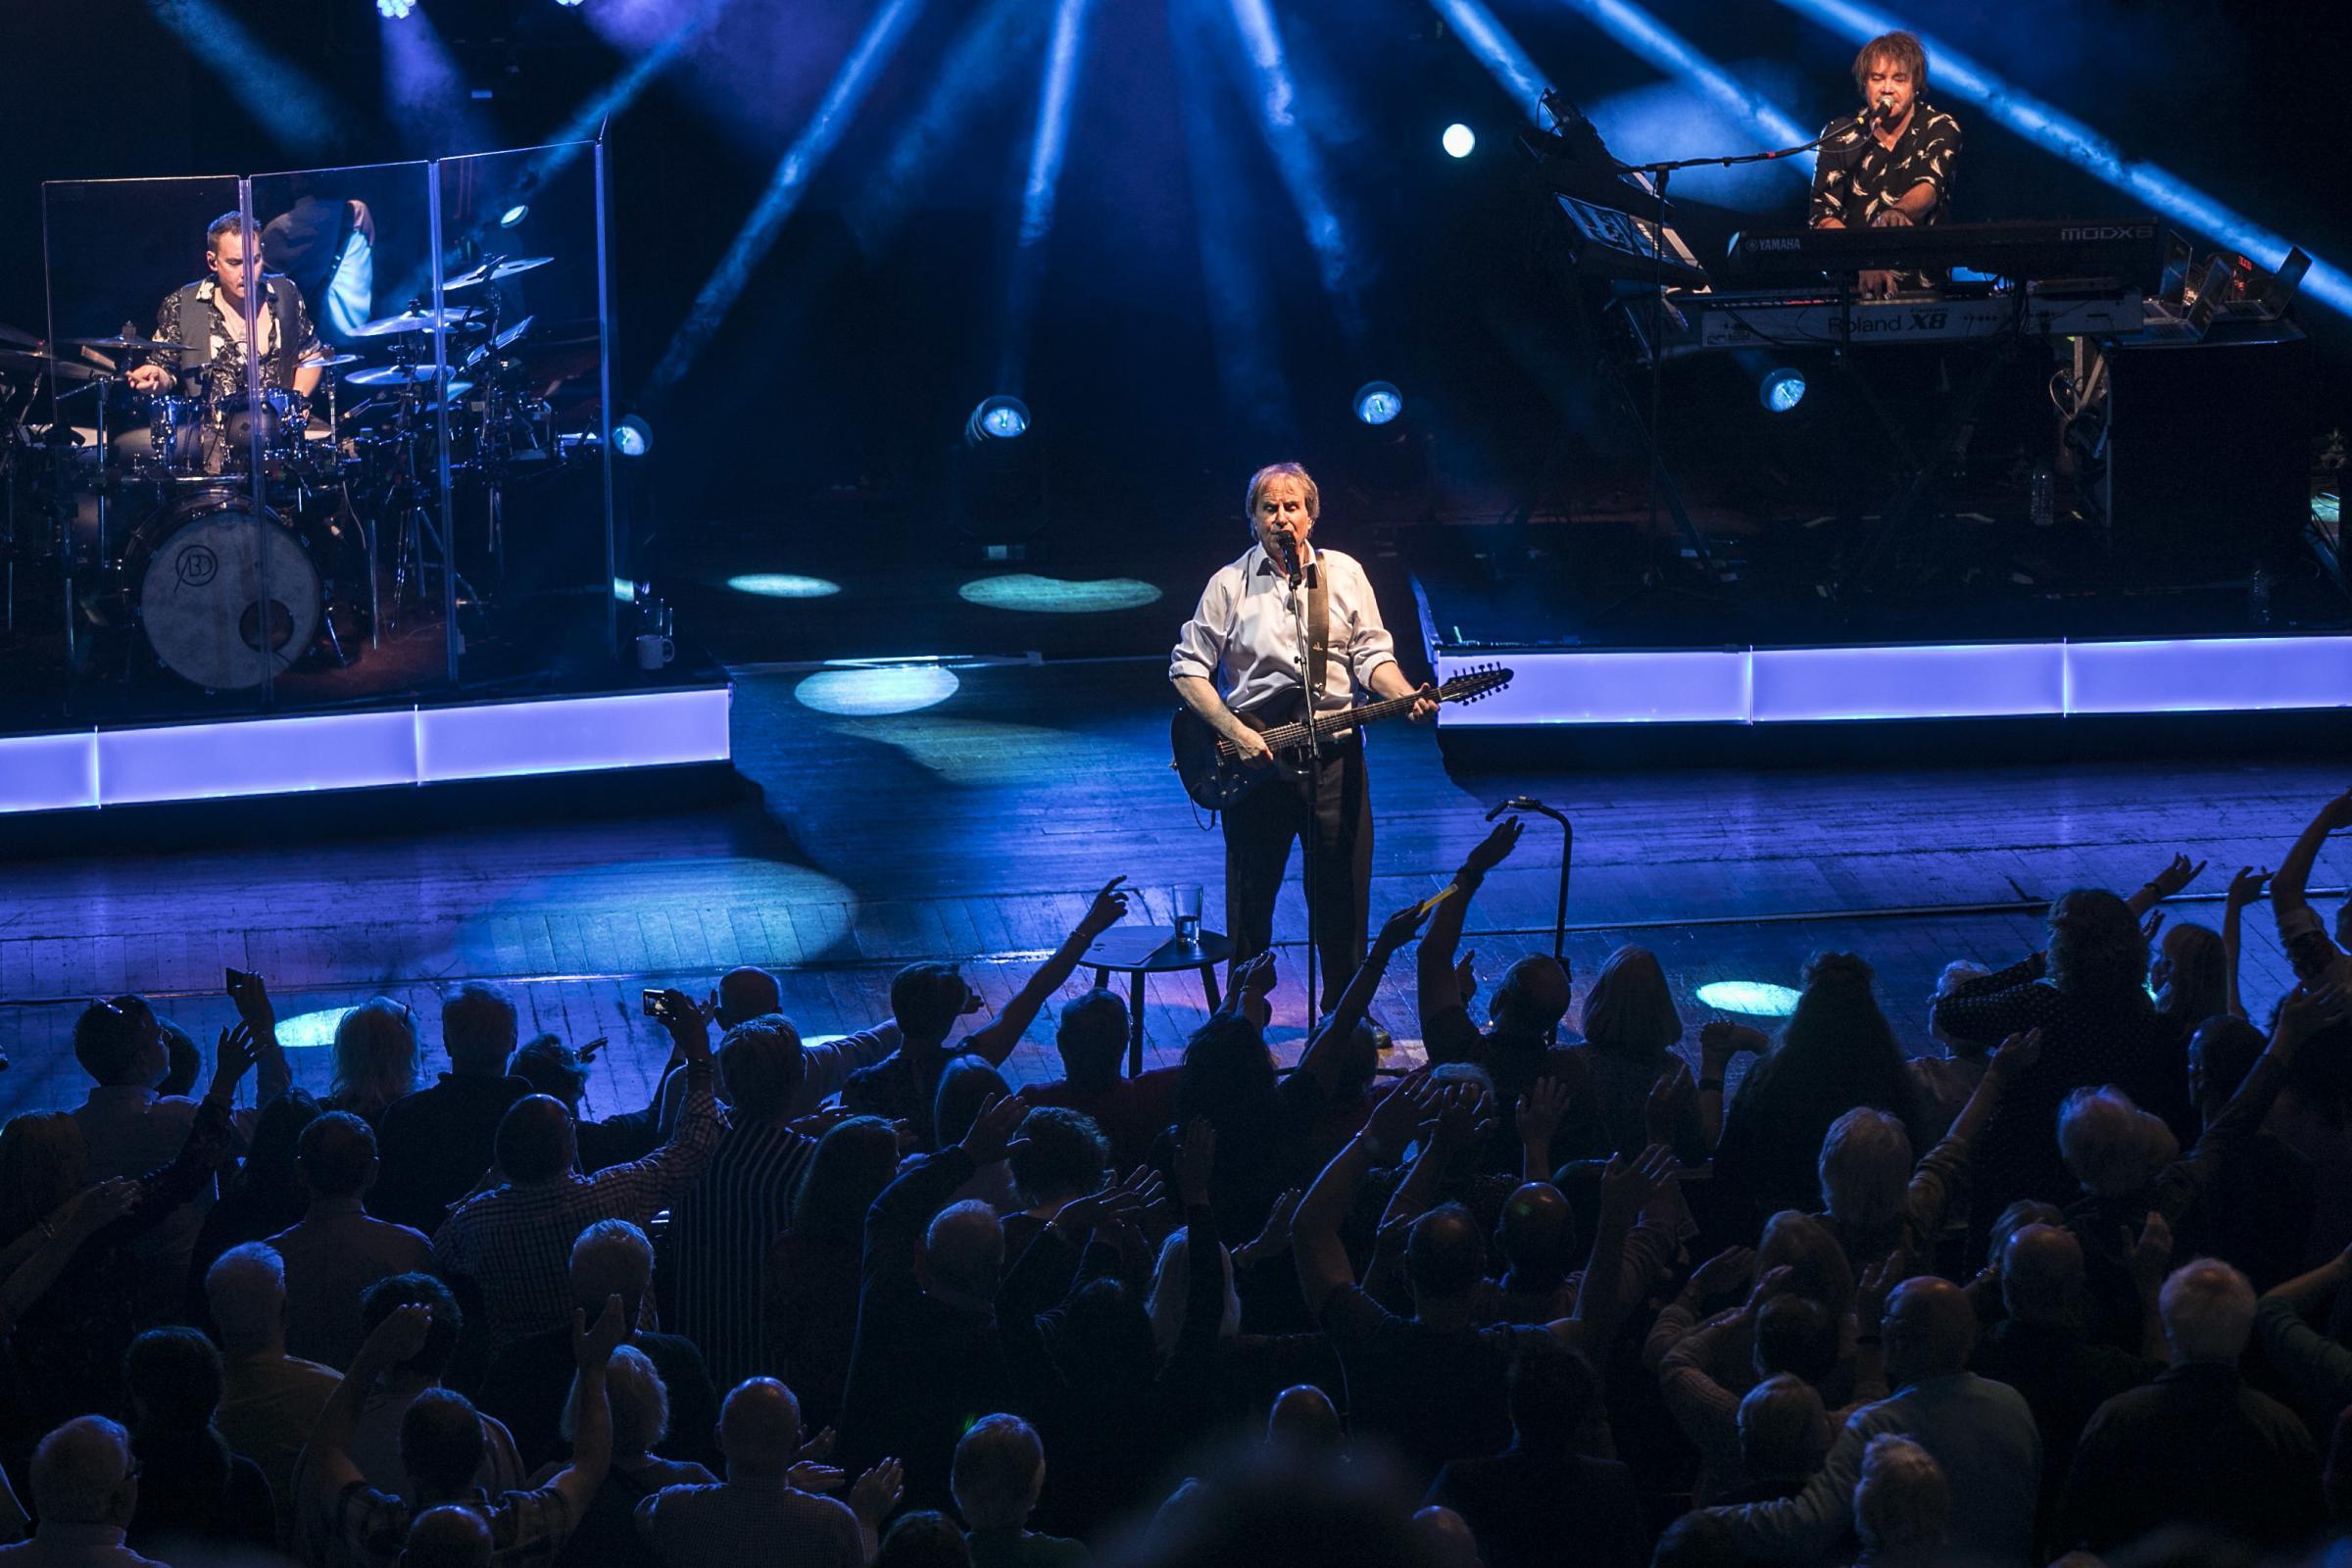 REVIEW: Chris de Burgh delights fans with intimate show at the Pavilion